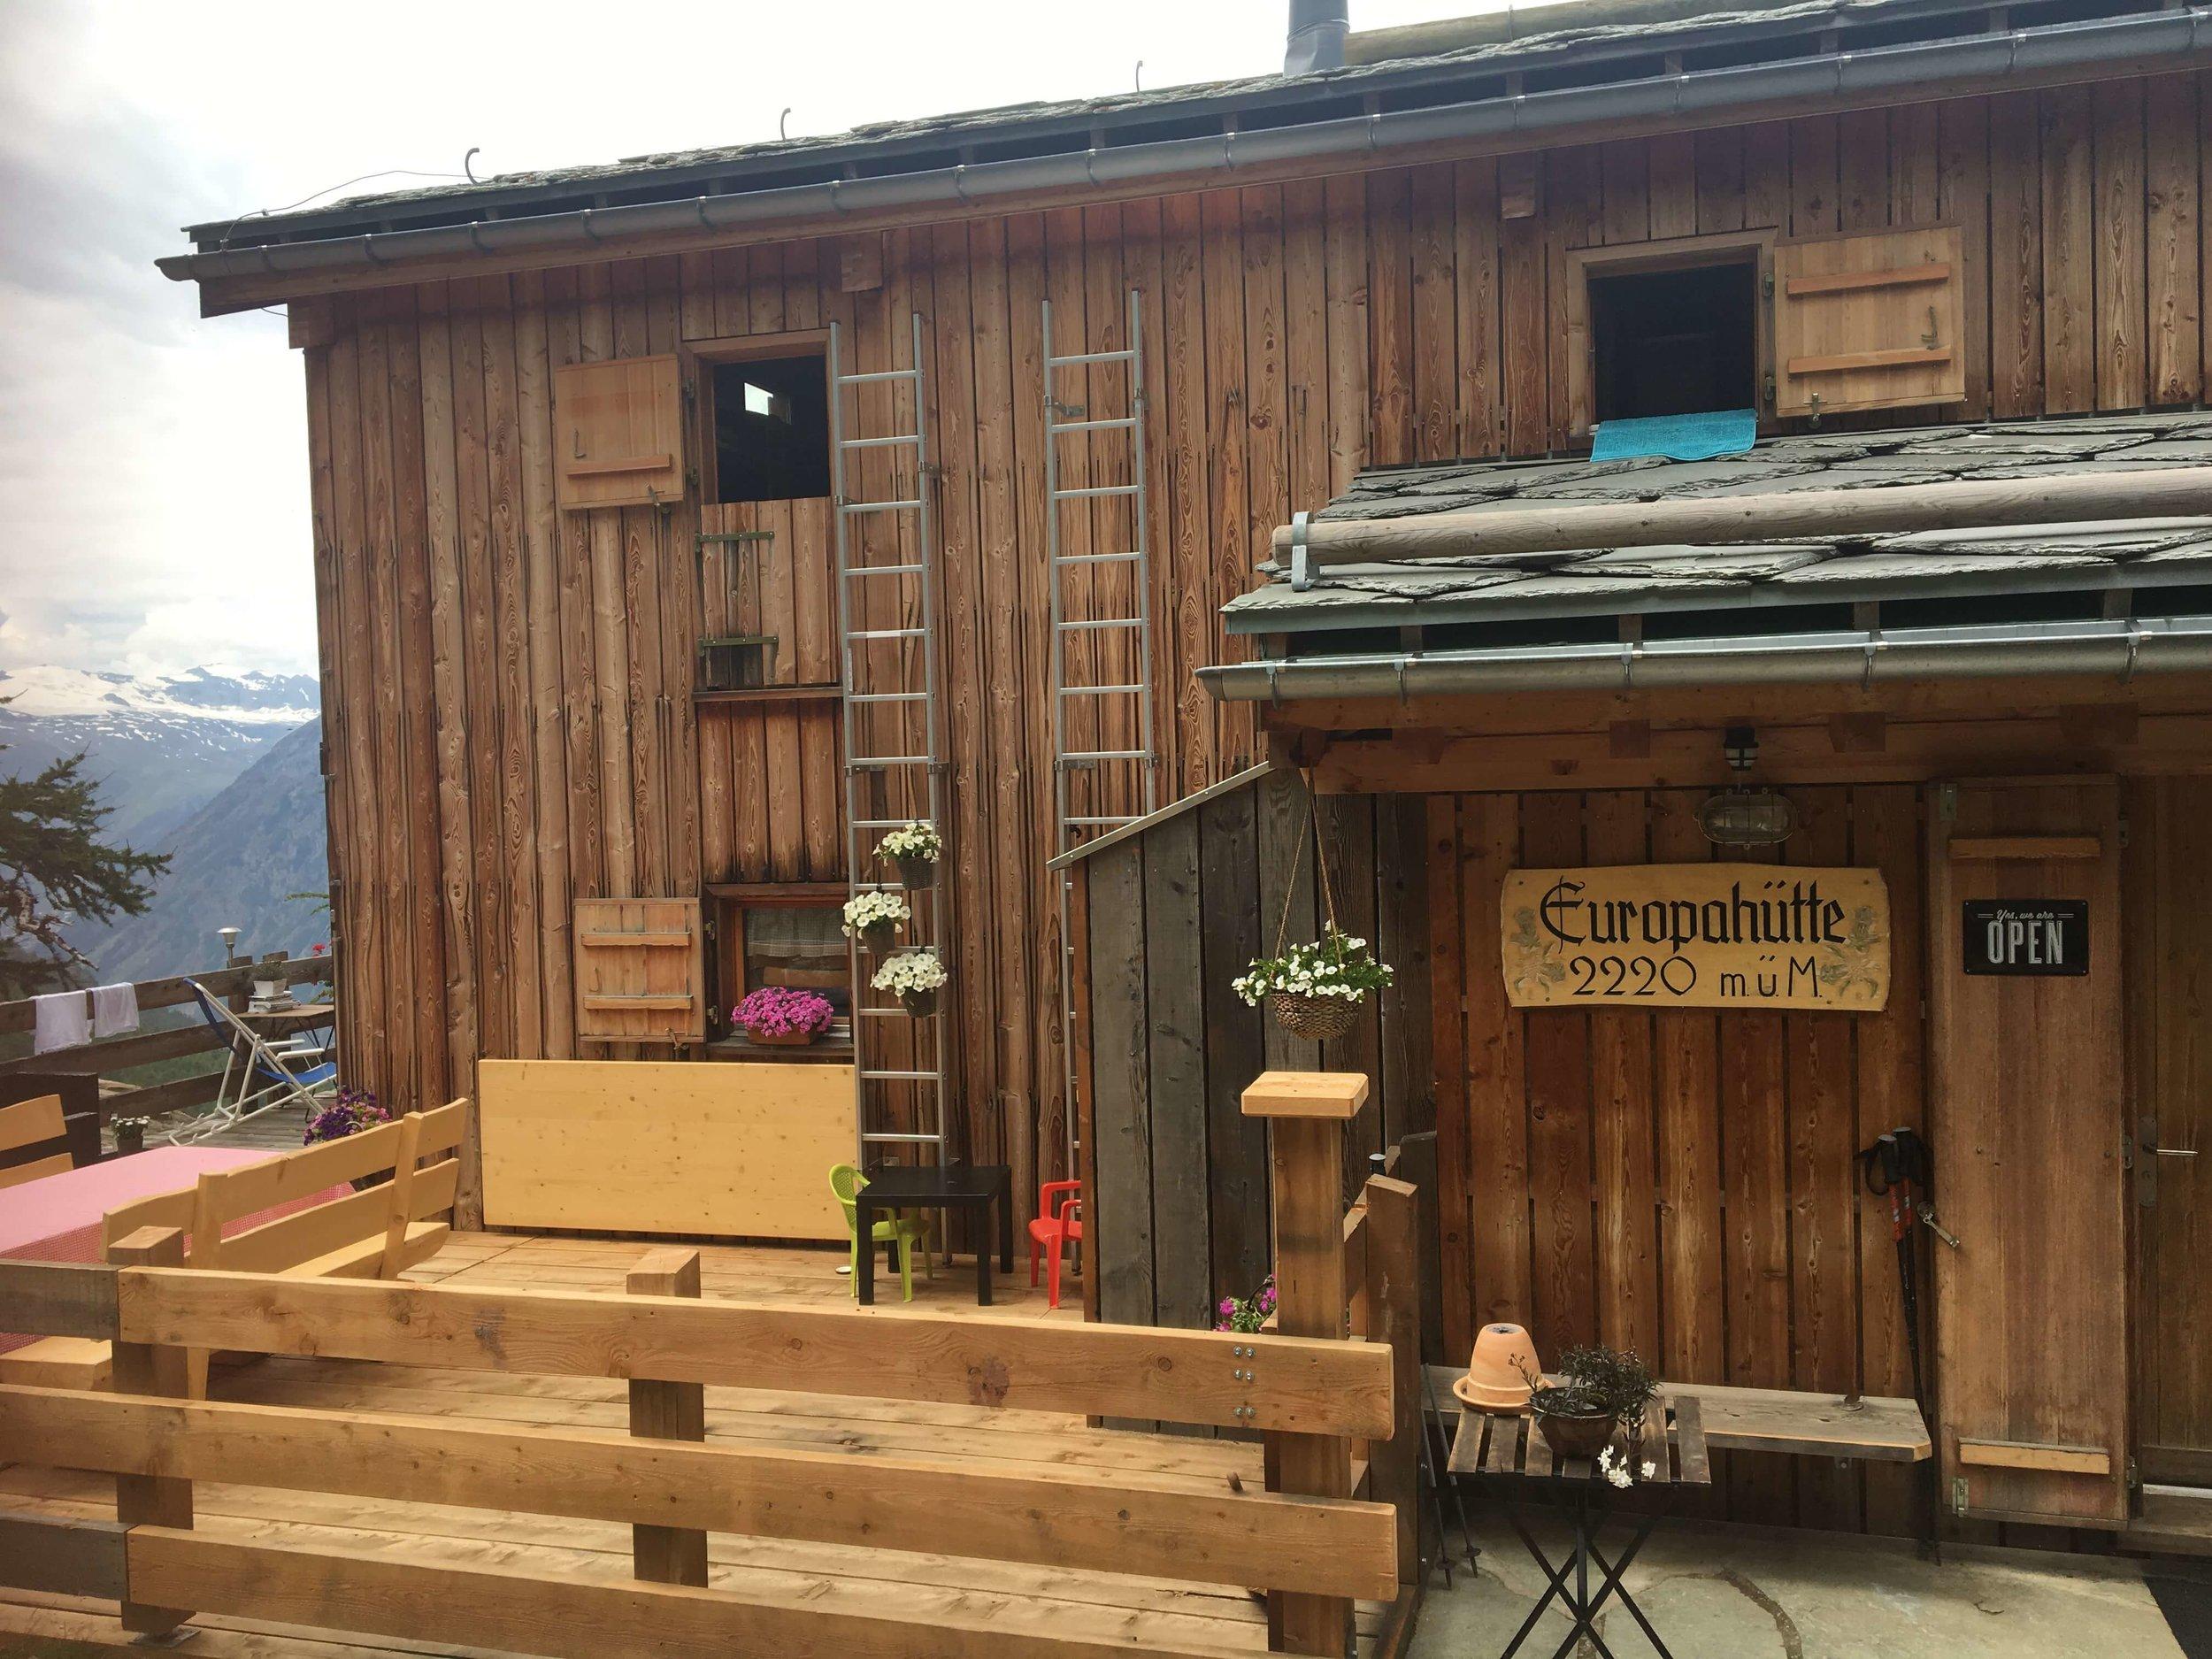 Chamonix to Zermatt accommodation